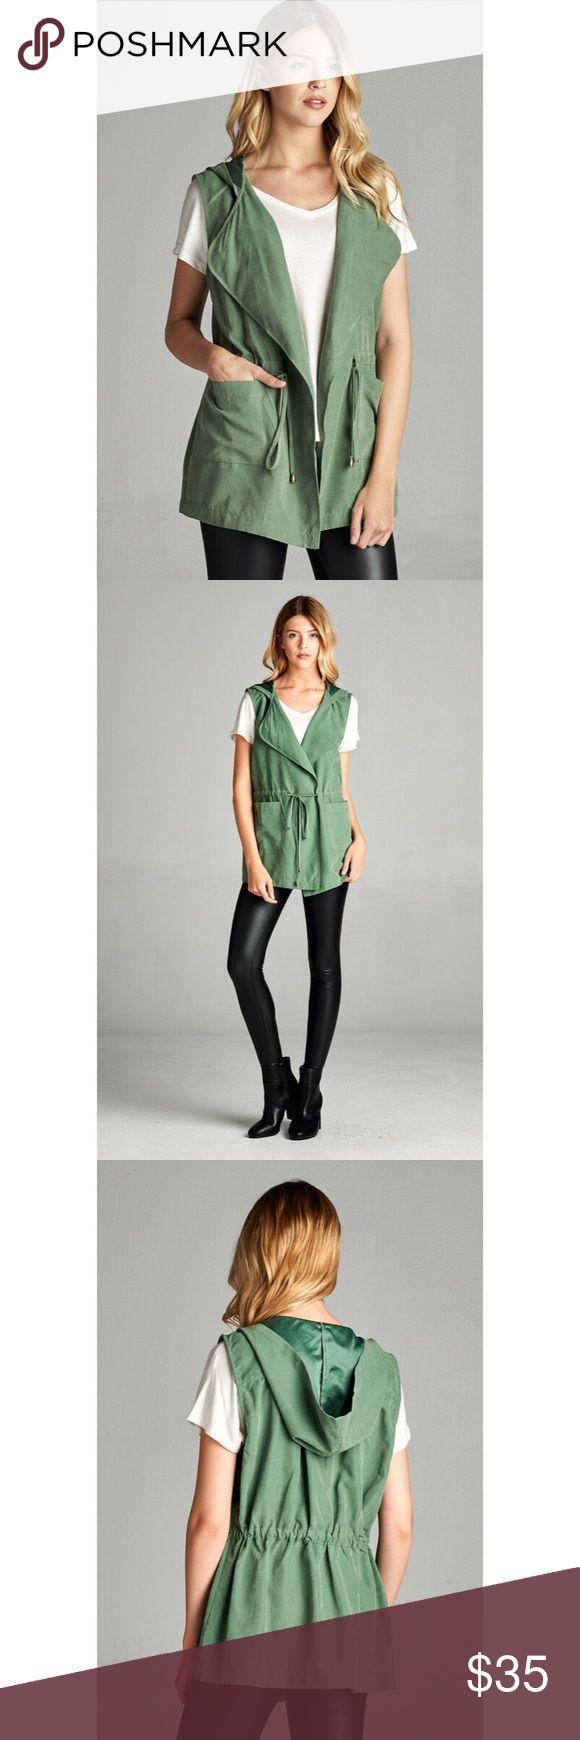 Coming soon! Green drawstring waist hooded vest Green ✖️ hooded ✖️ drawstring waist ✖️vest Tops